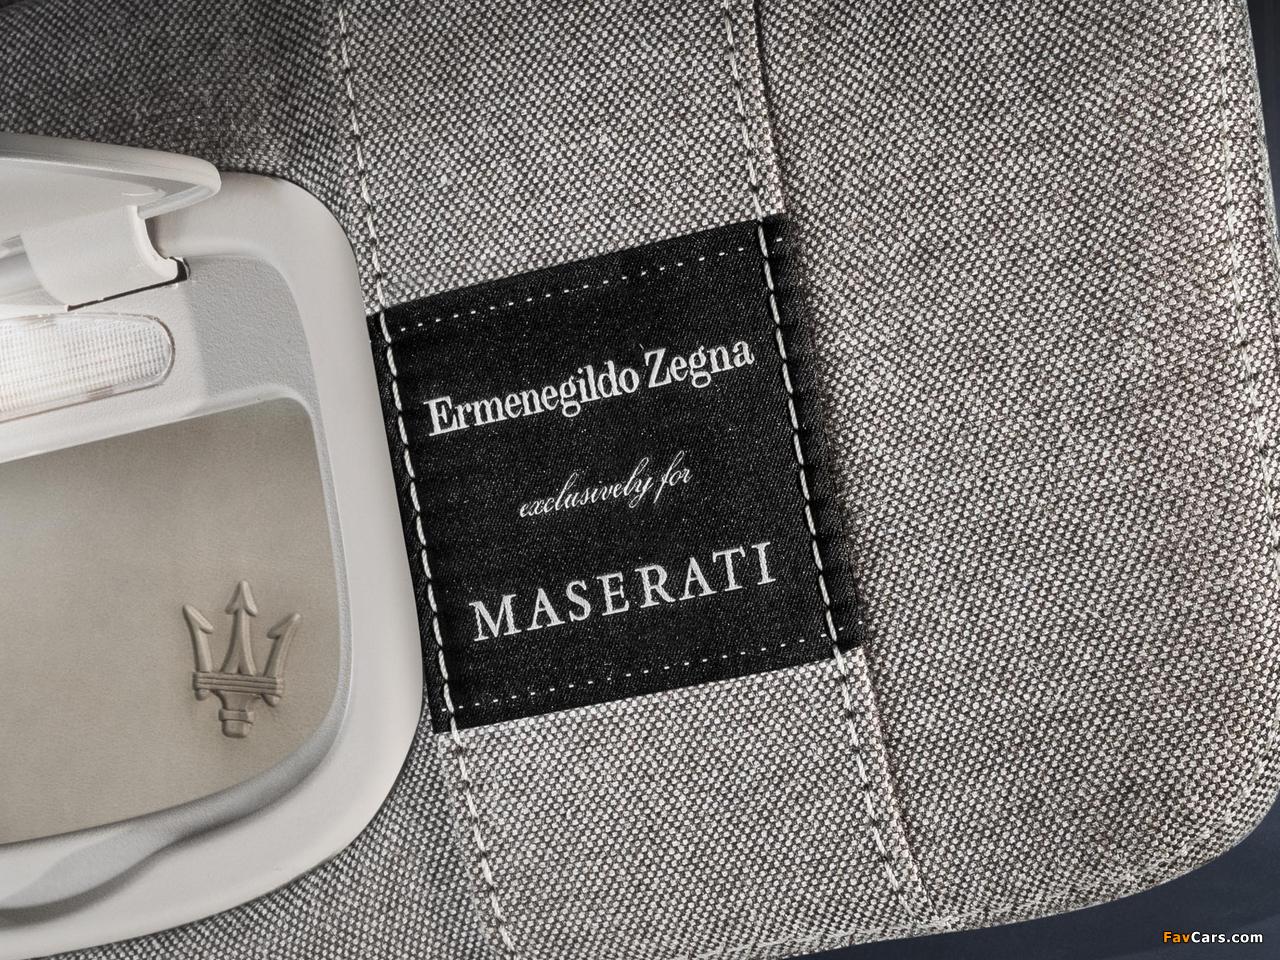 Images of Maserati Quattroporte Ermenegildo Zegna 2014 (1280 x 960)